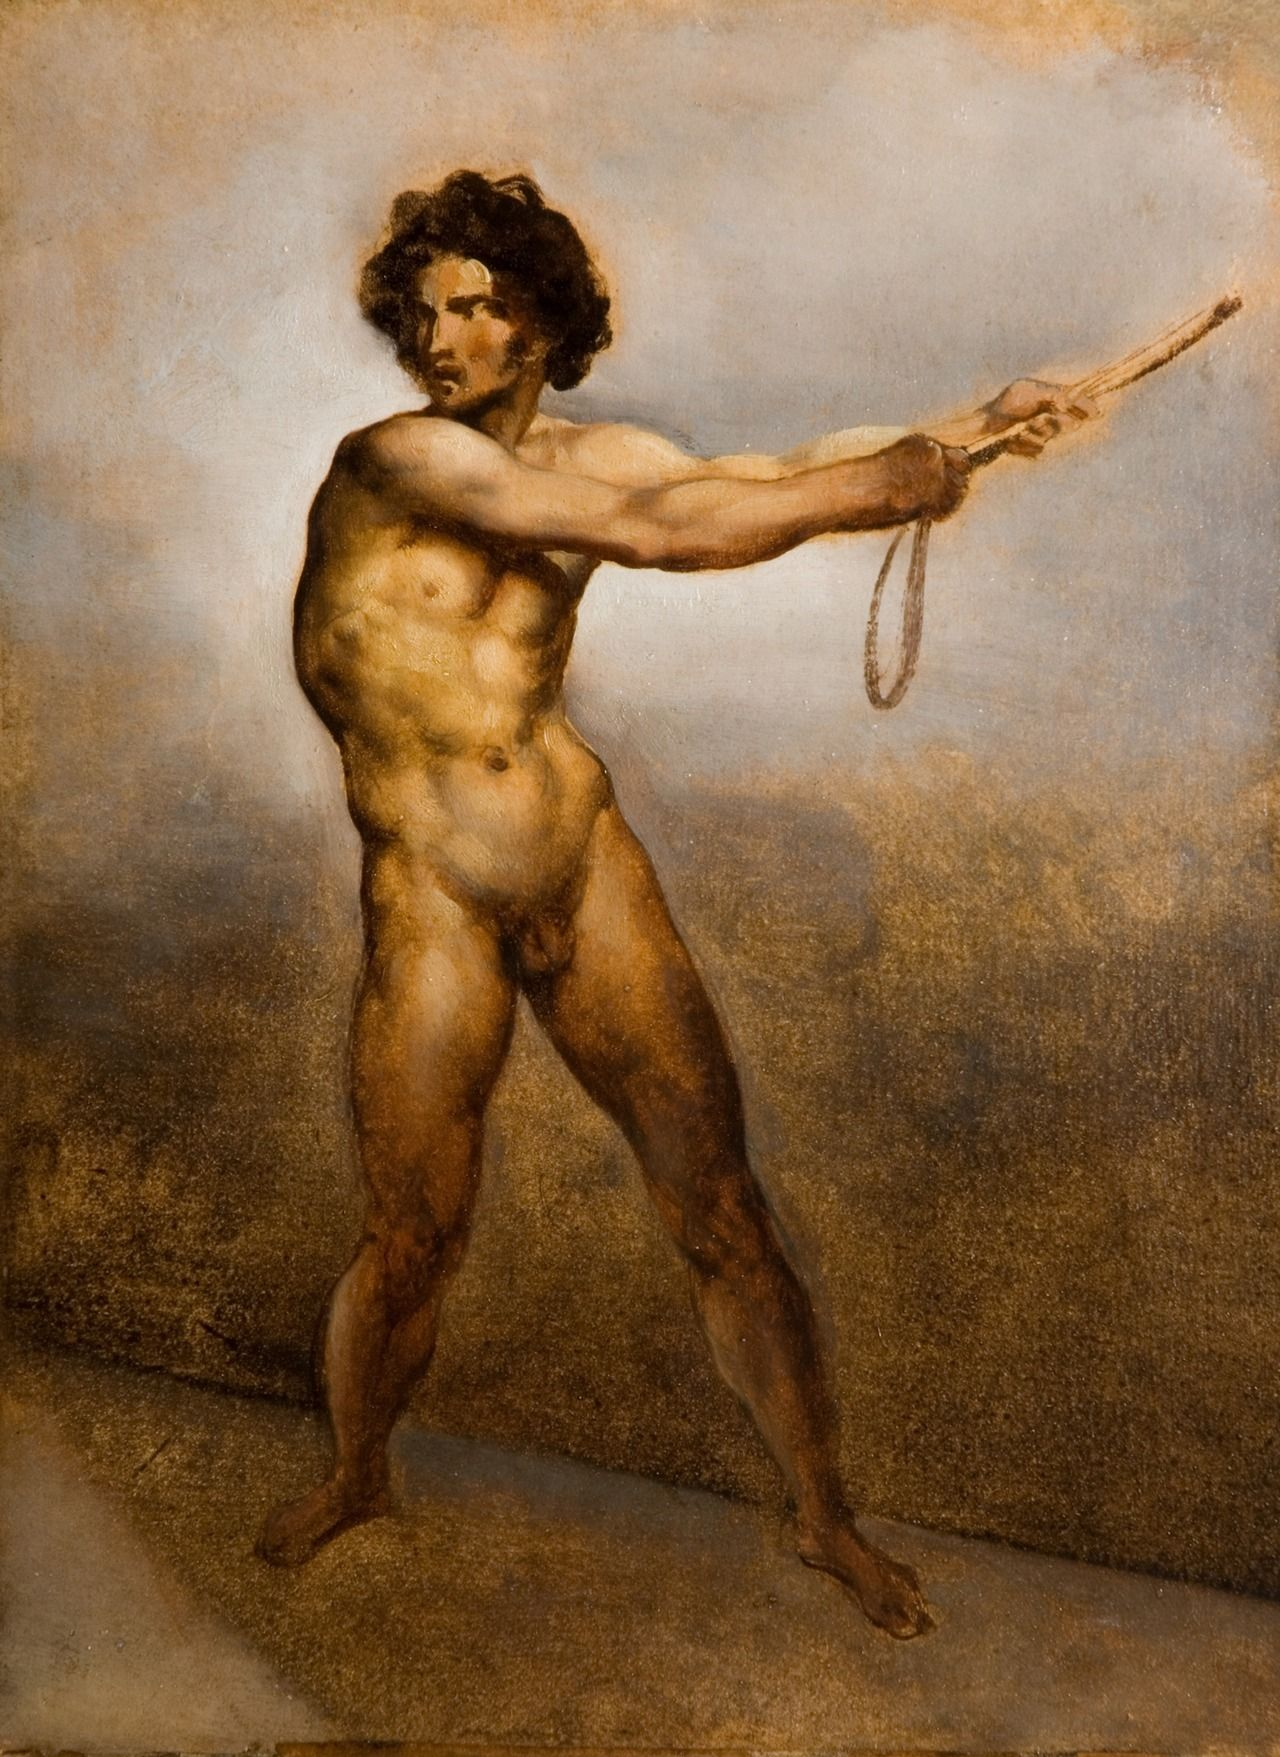 Nude theodore gericault male